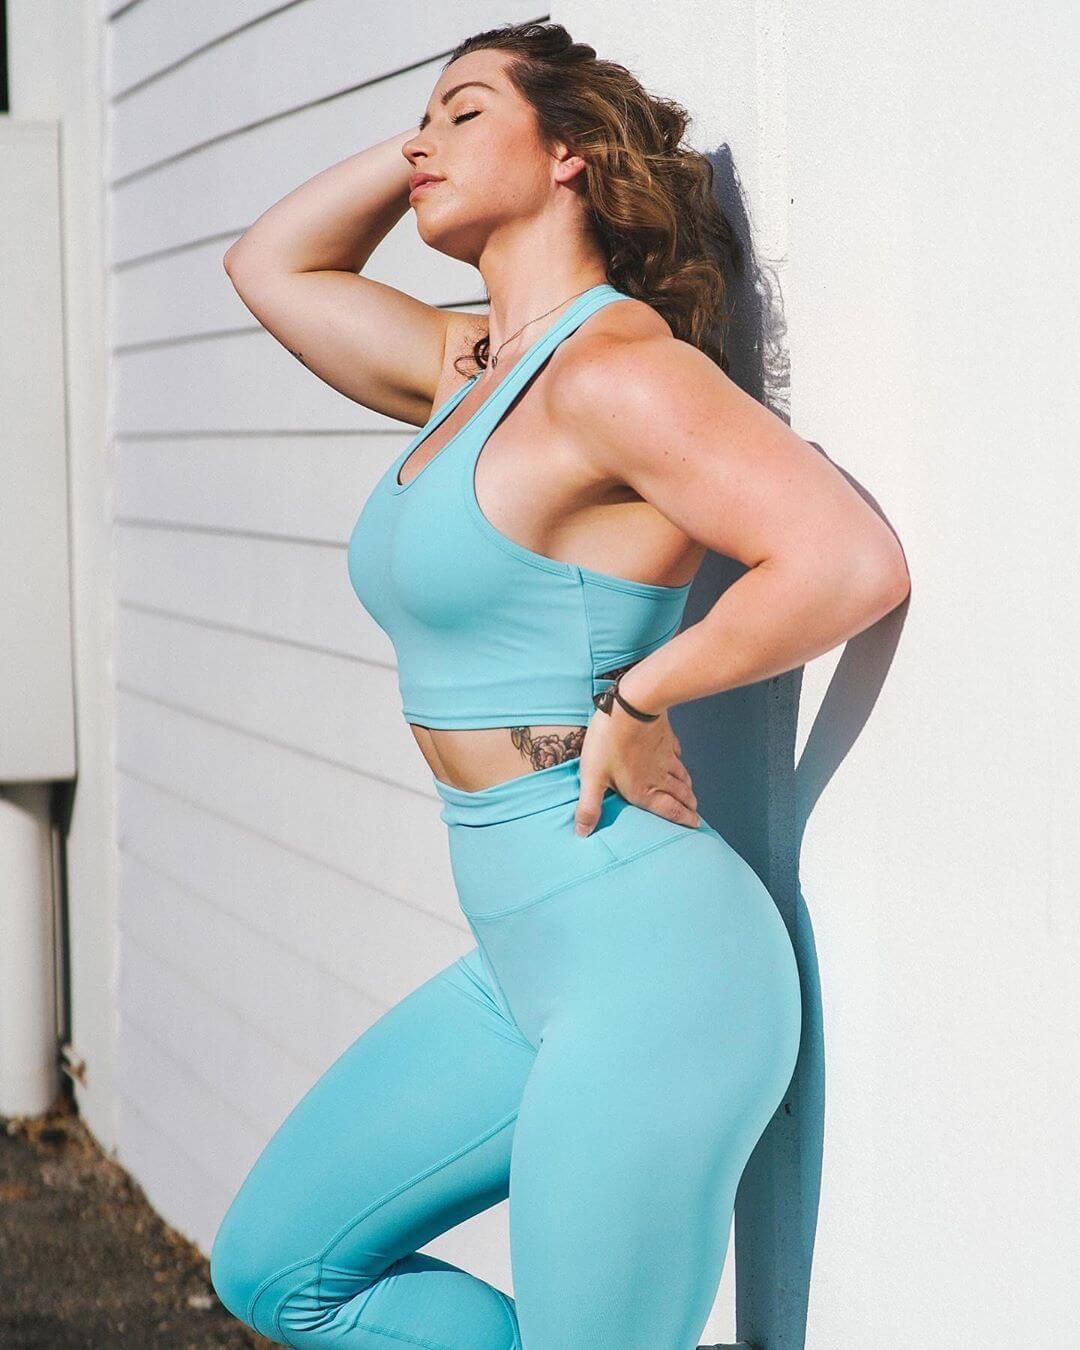 Haley Johnson Images